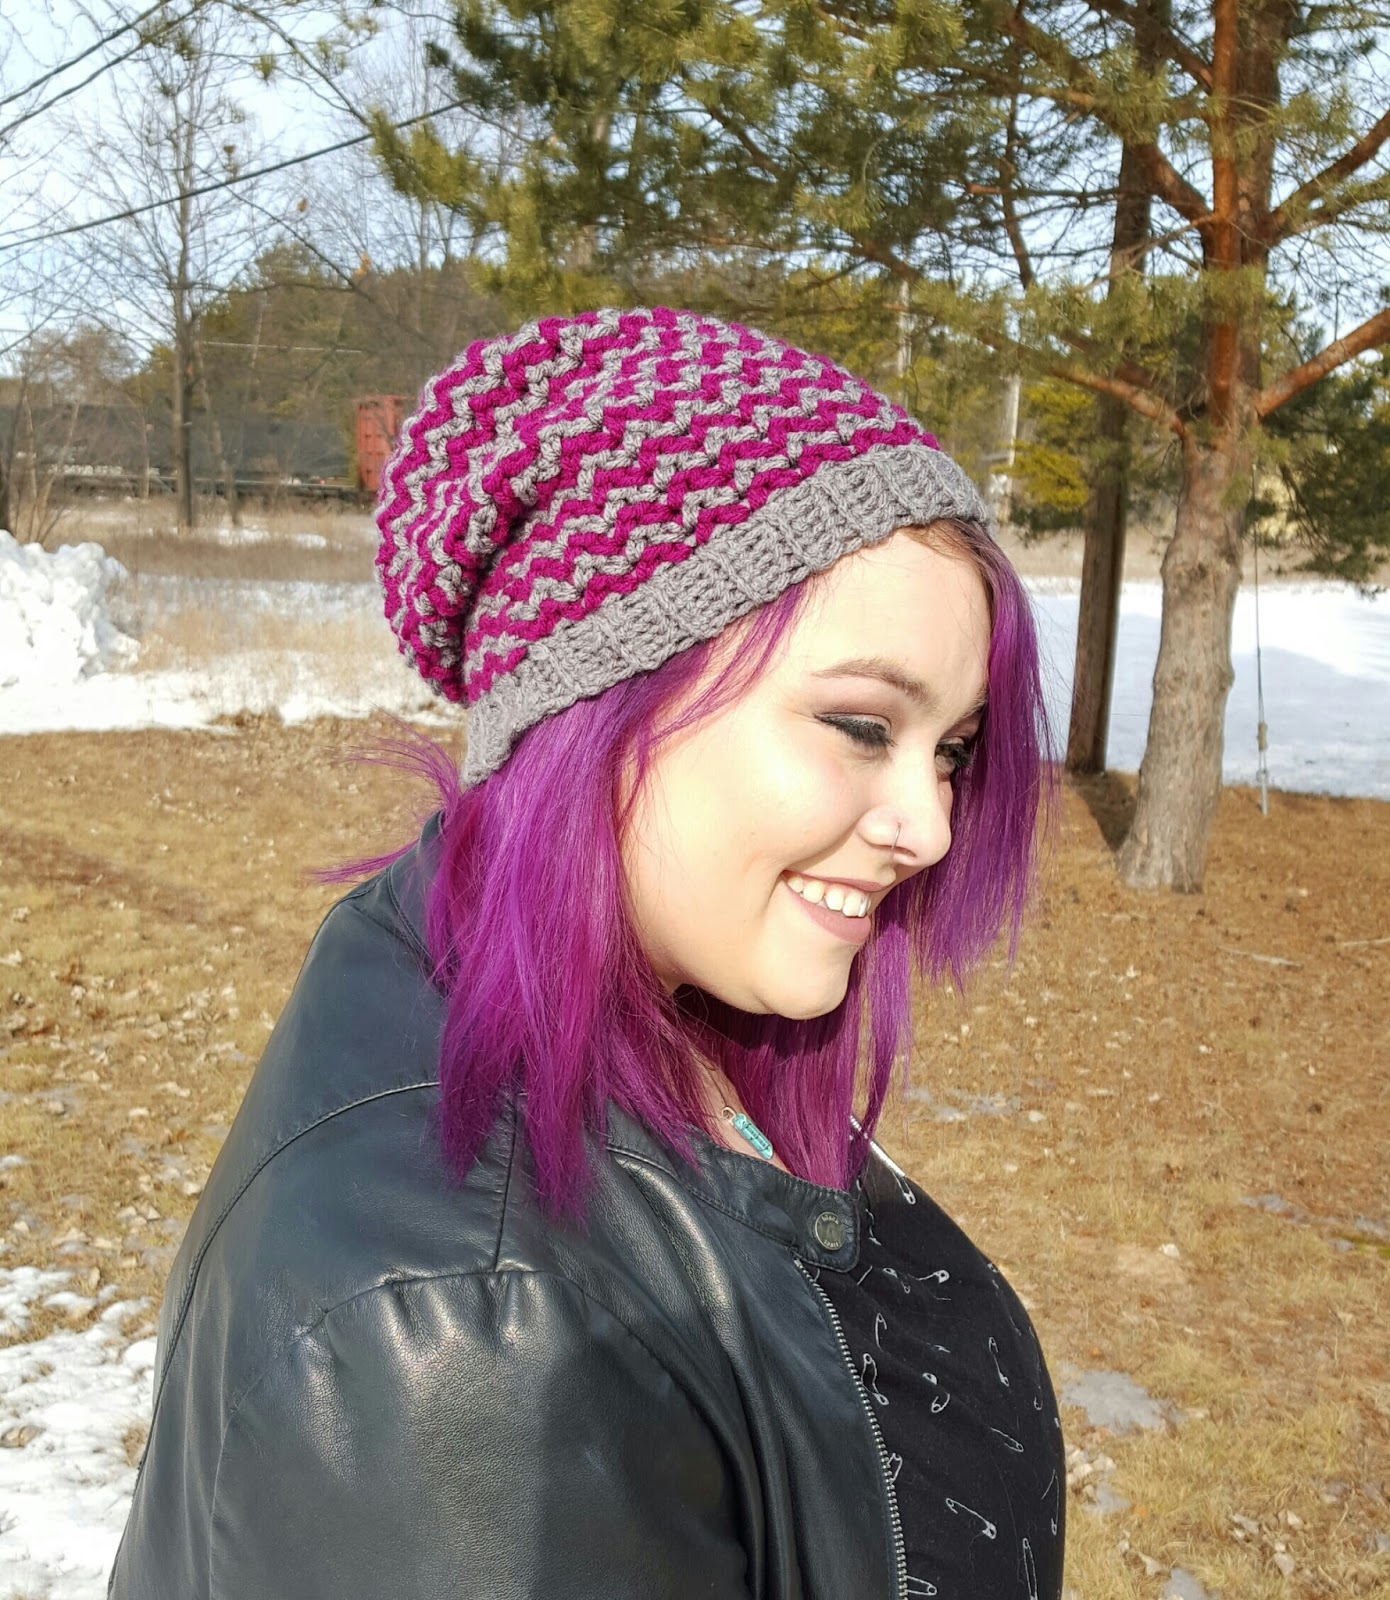 Crochet Patterns Archives - Cozy Soul Crochet